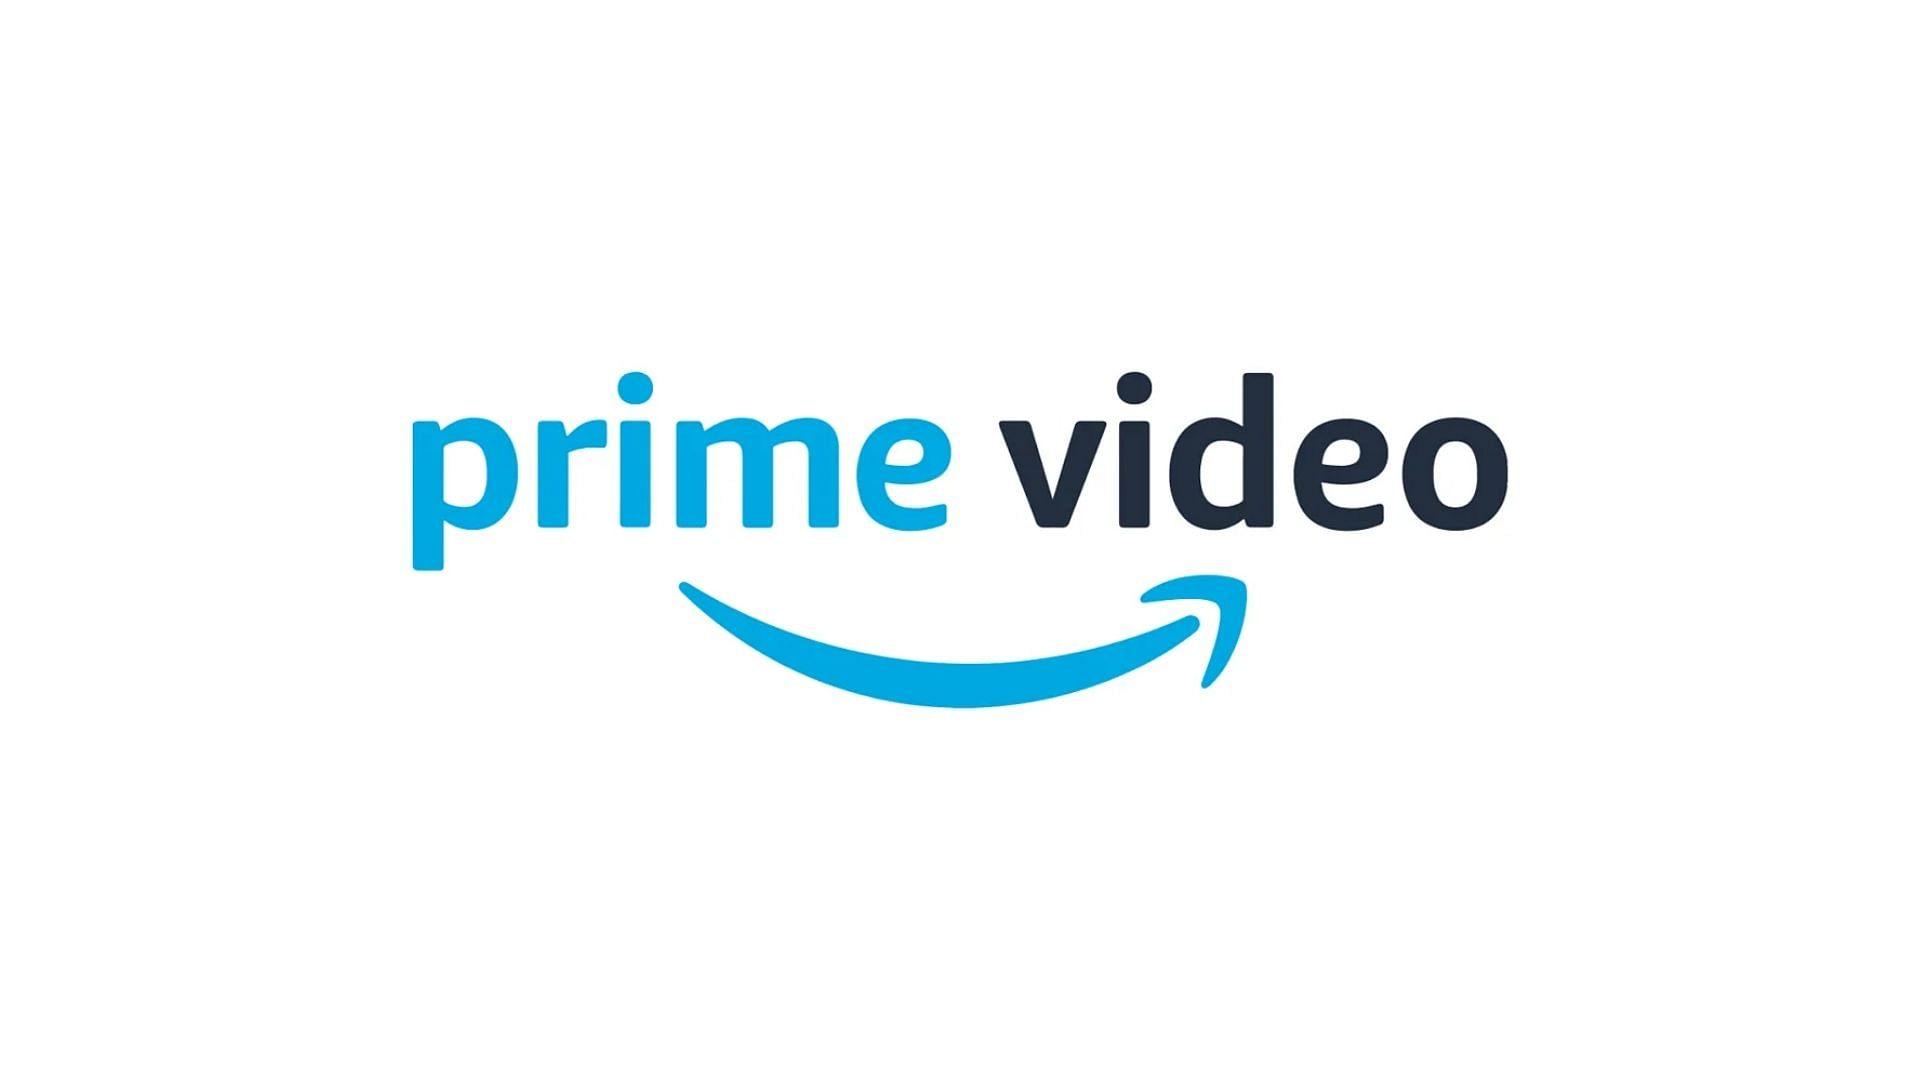 prime video?blur=25